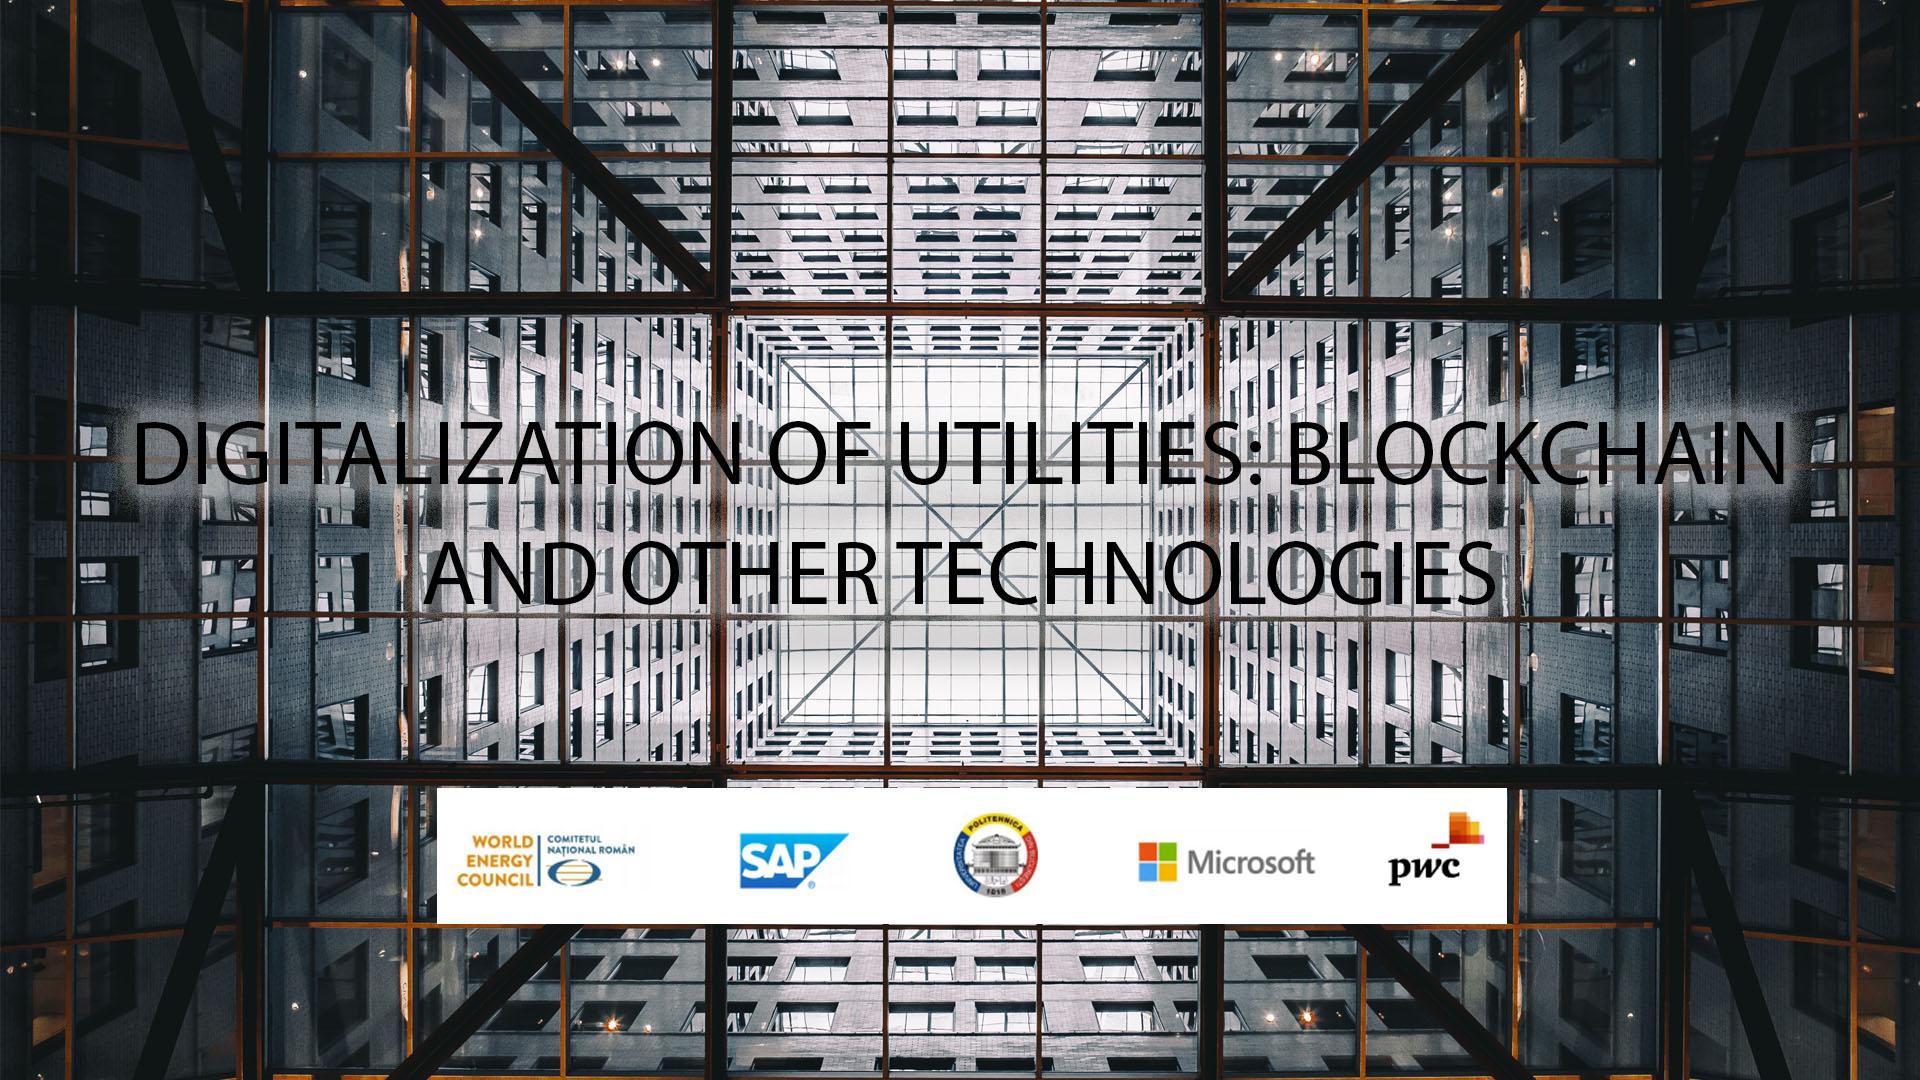 DIGITALIZATION OF UTILITIES BLOCKCHAIN AND OTHER TECHNOLOGIES, UPB, Politehnica